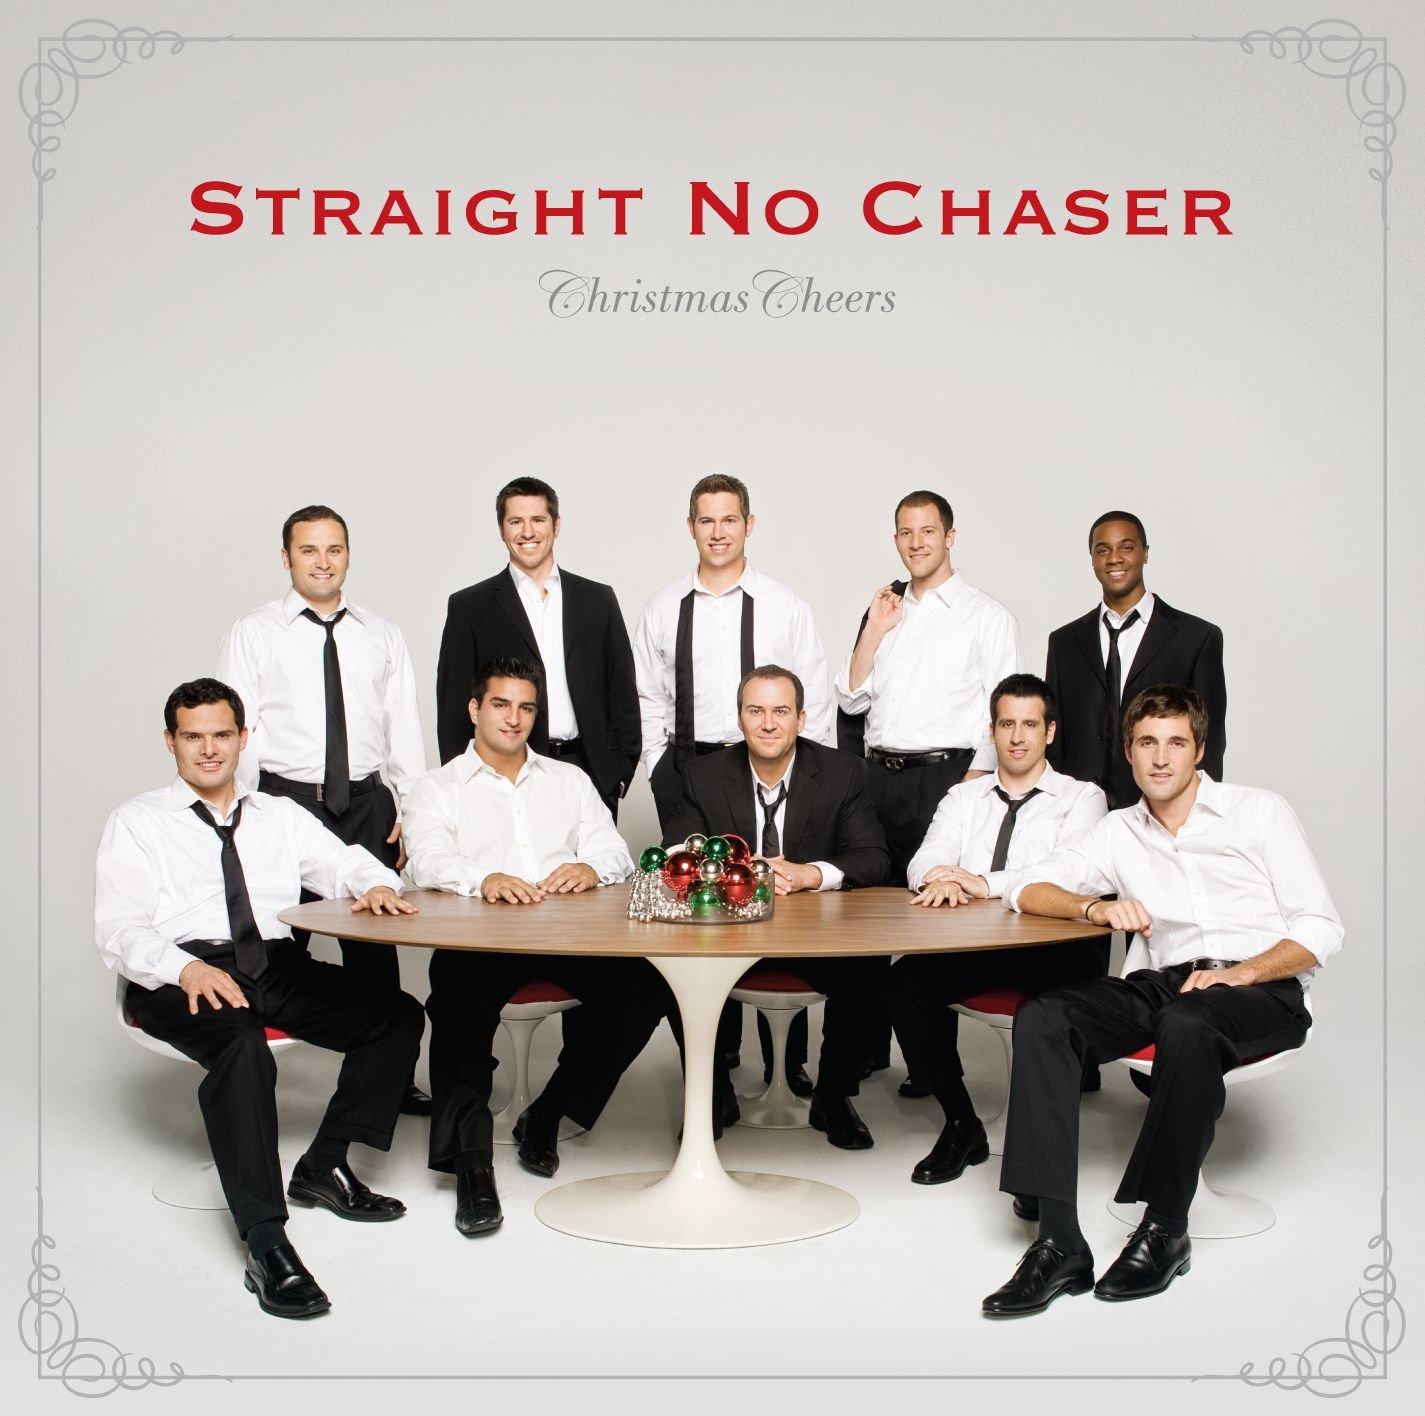 Straight No Chaser - Christmas Cheers - Amazon.com Music